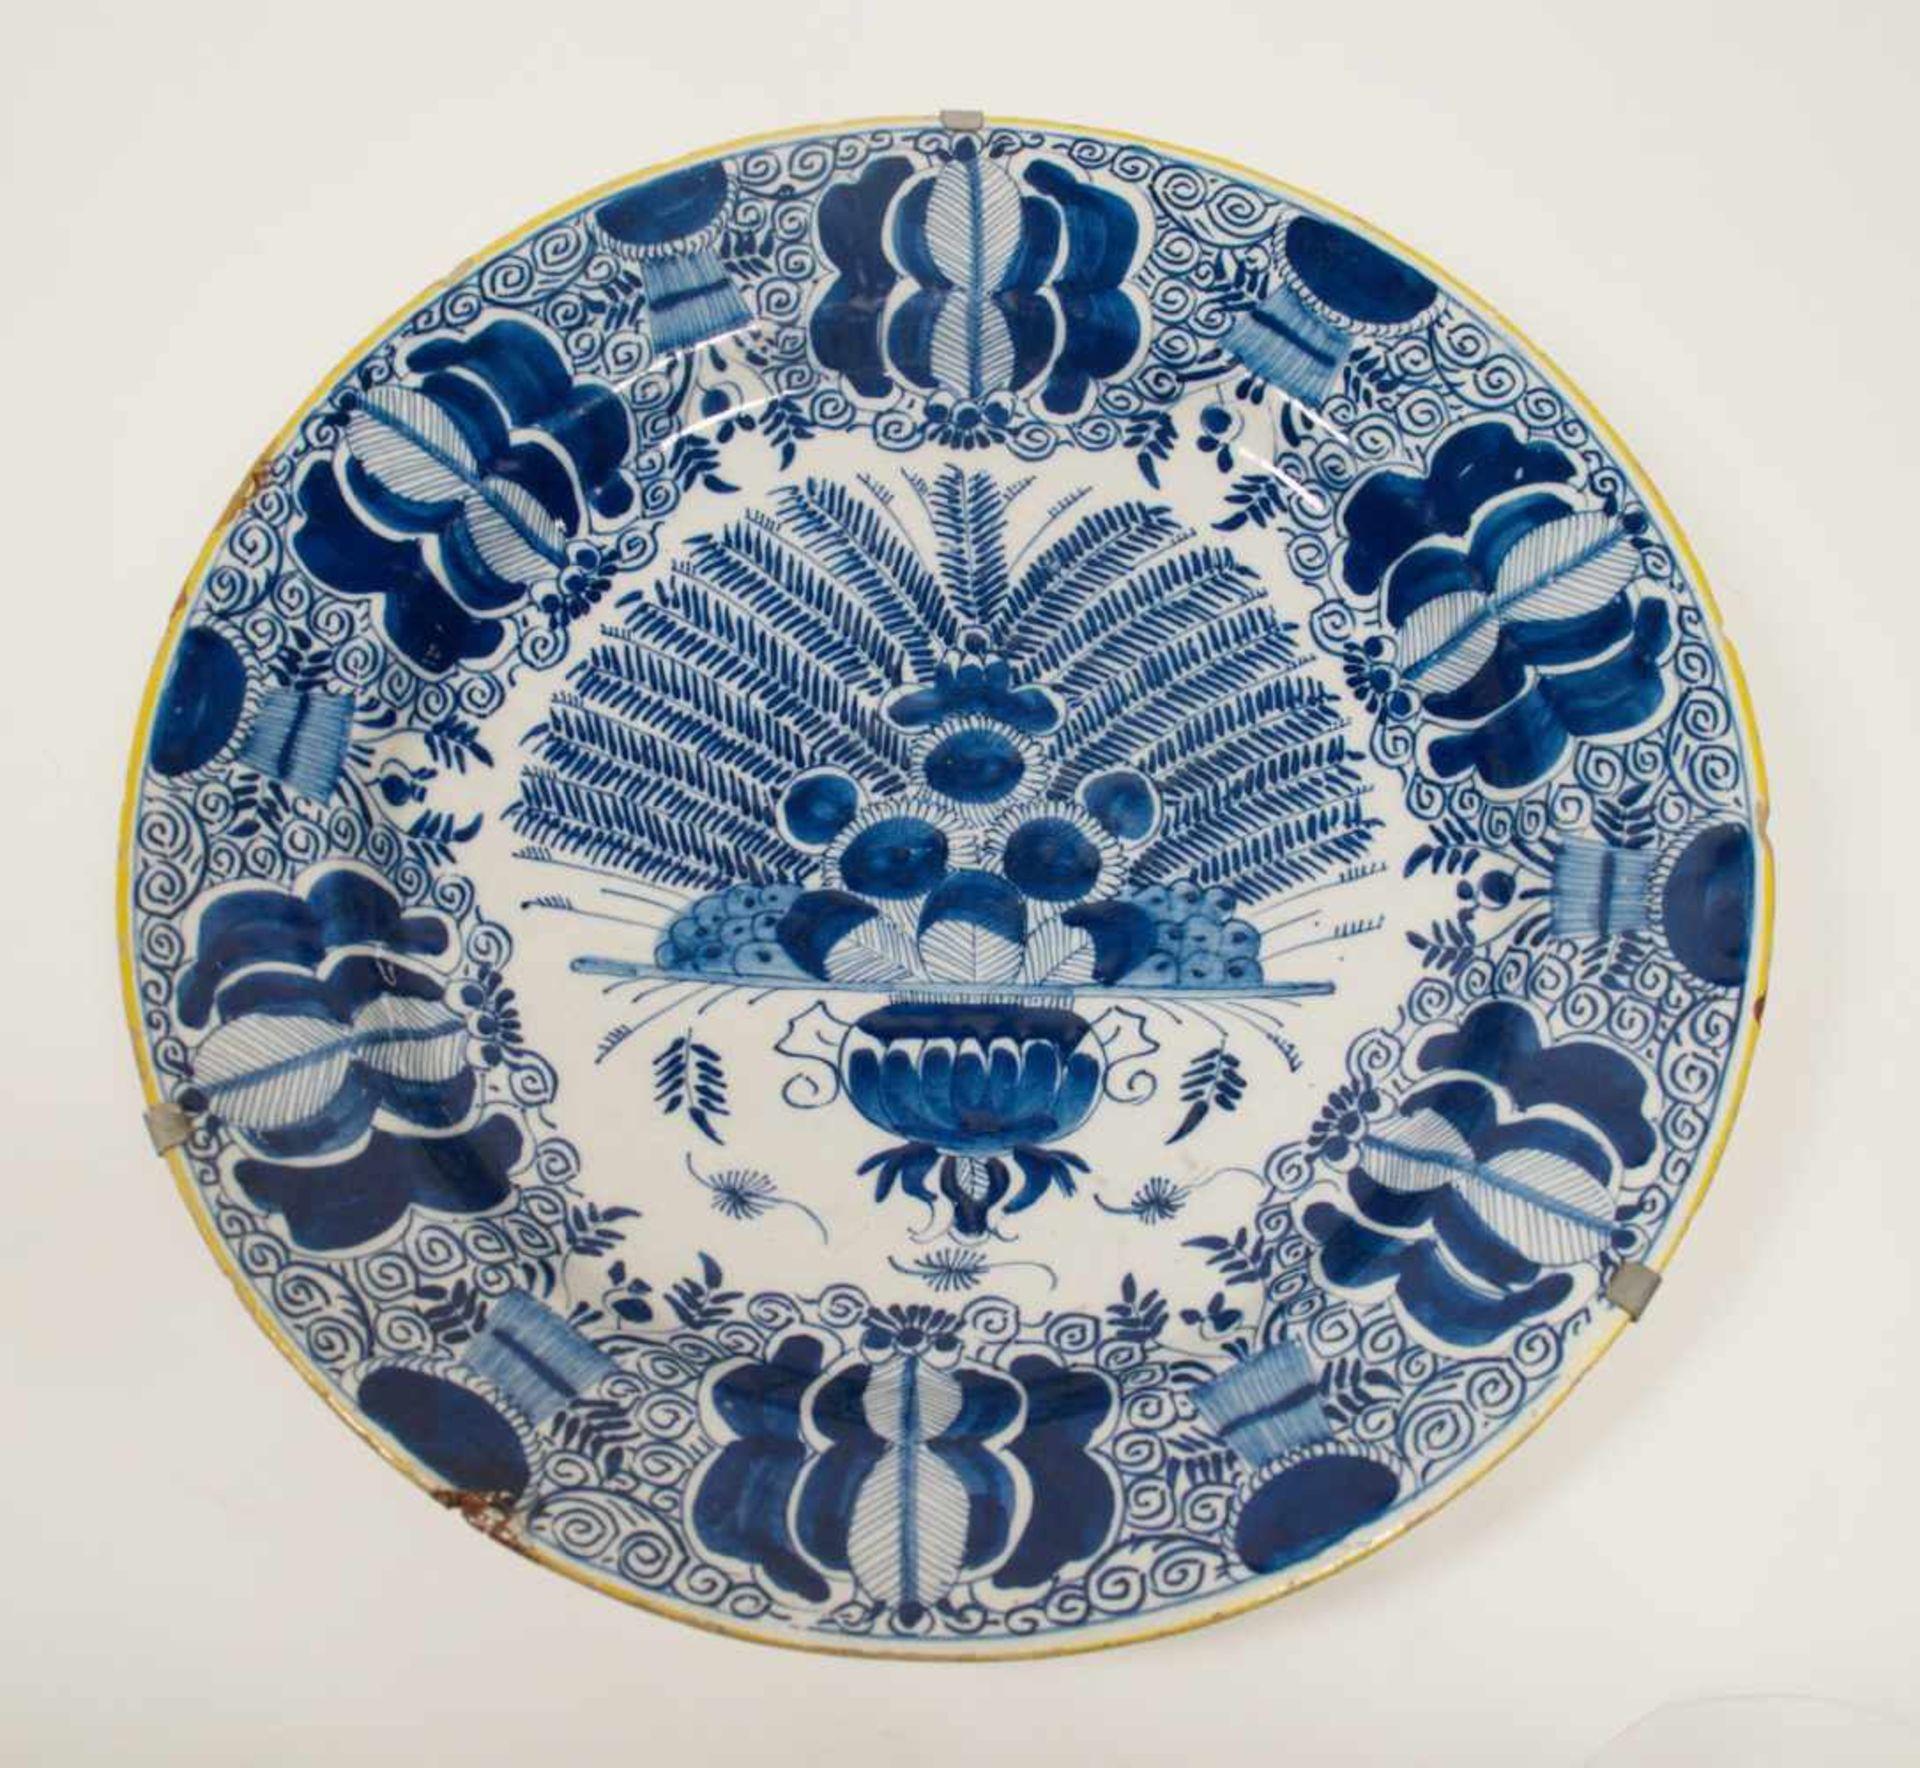 Los 22 - Großer Pfauenteller, Delft Mitte 18. Jh.,Blaumalerei, Dm 35,5 cm